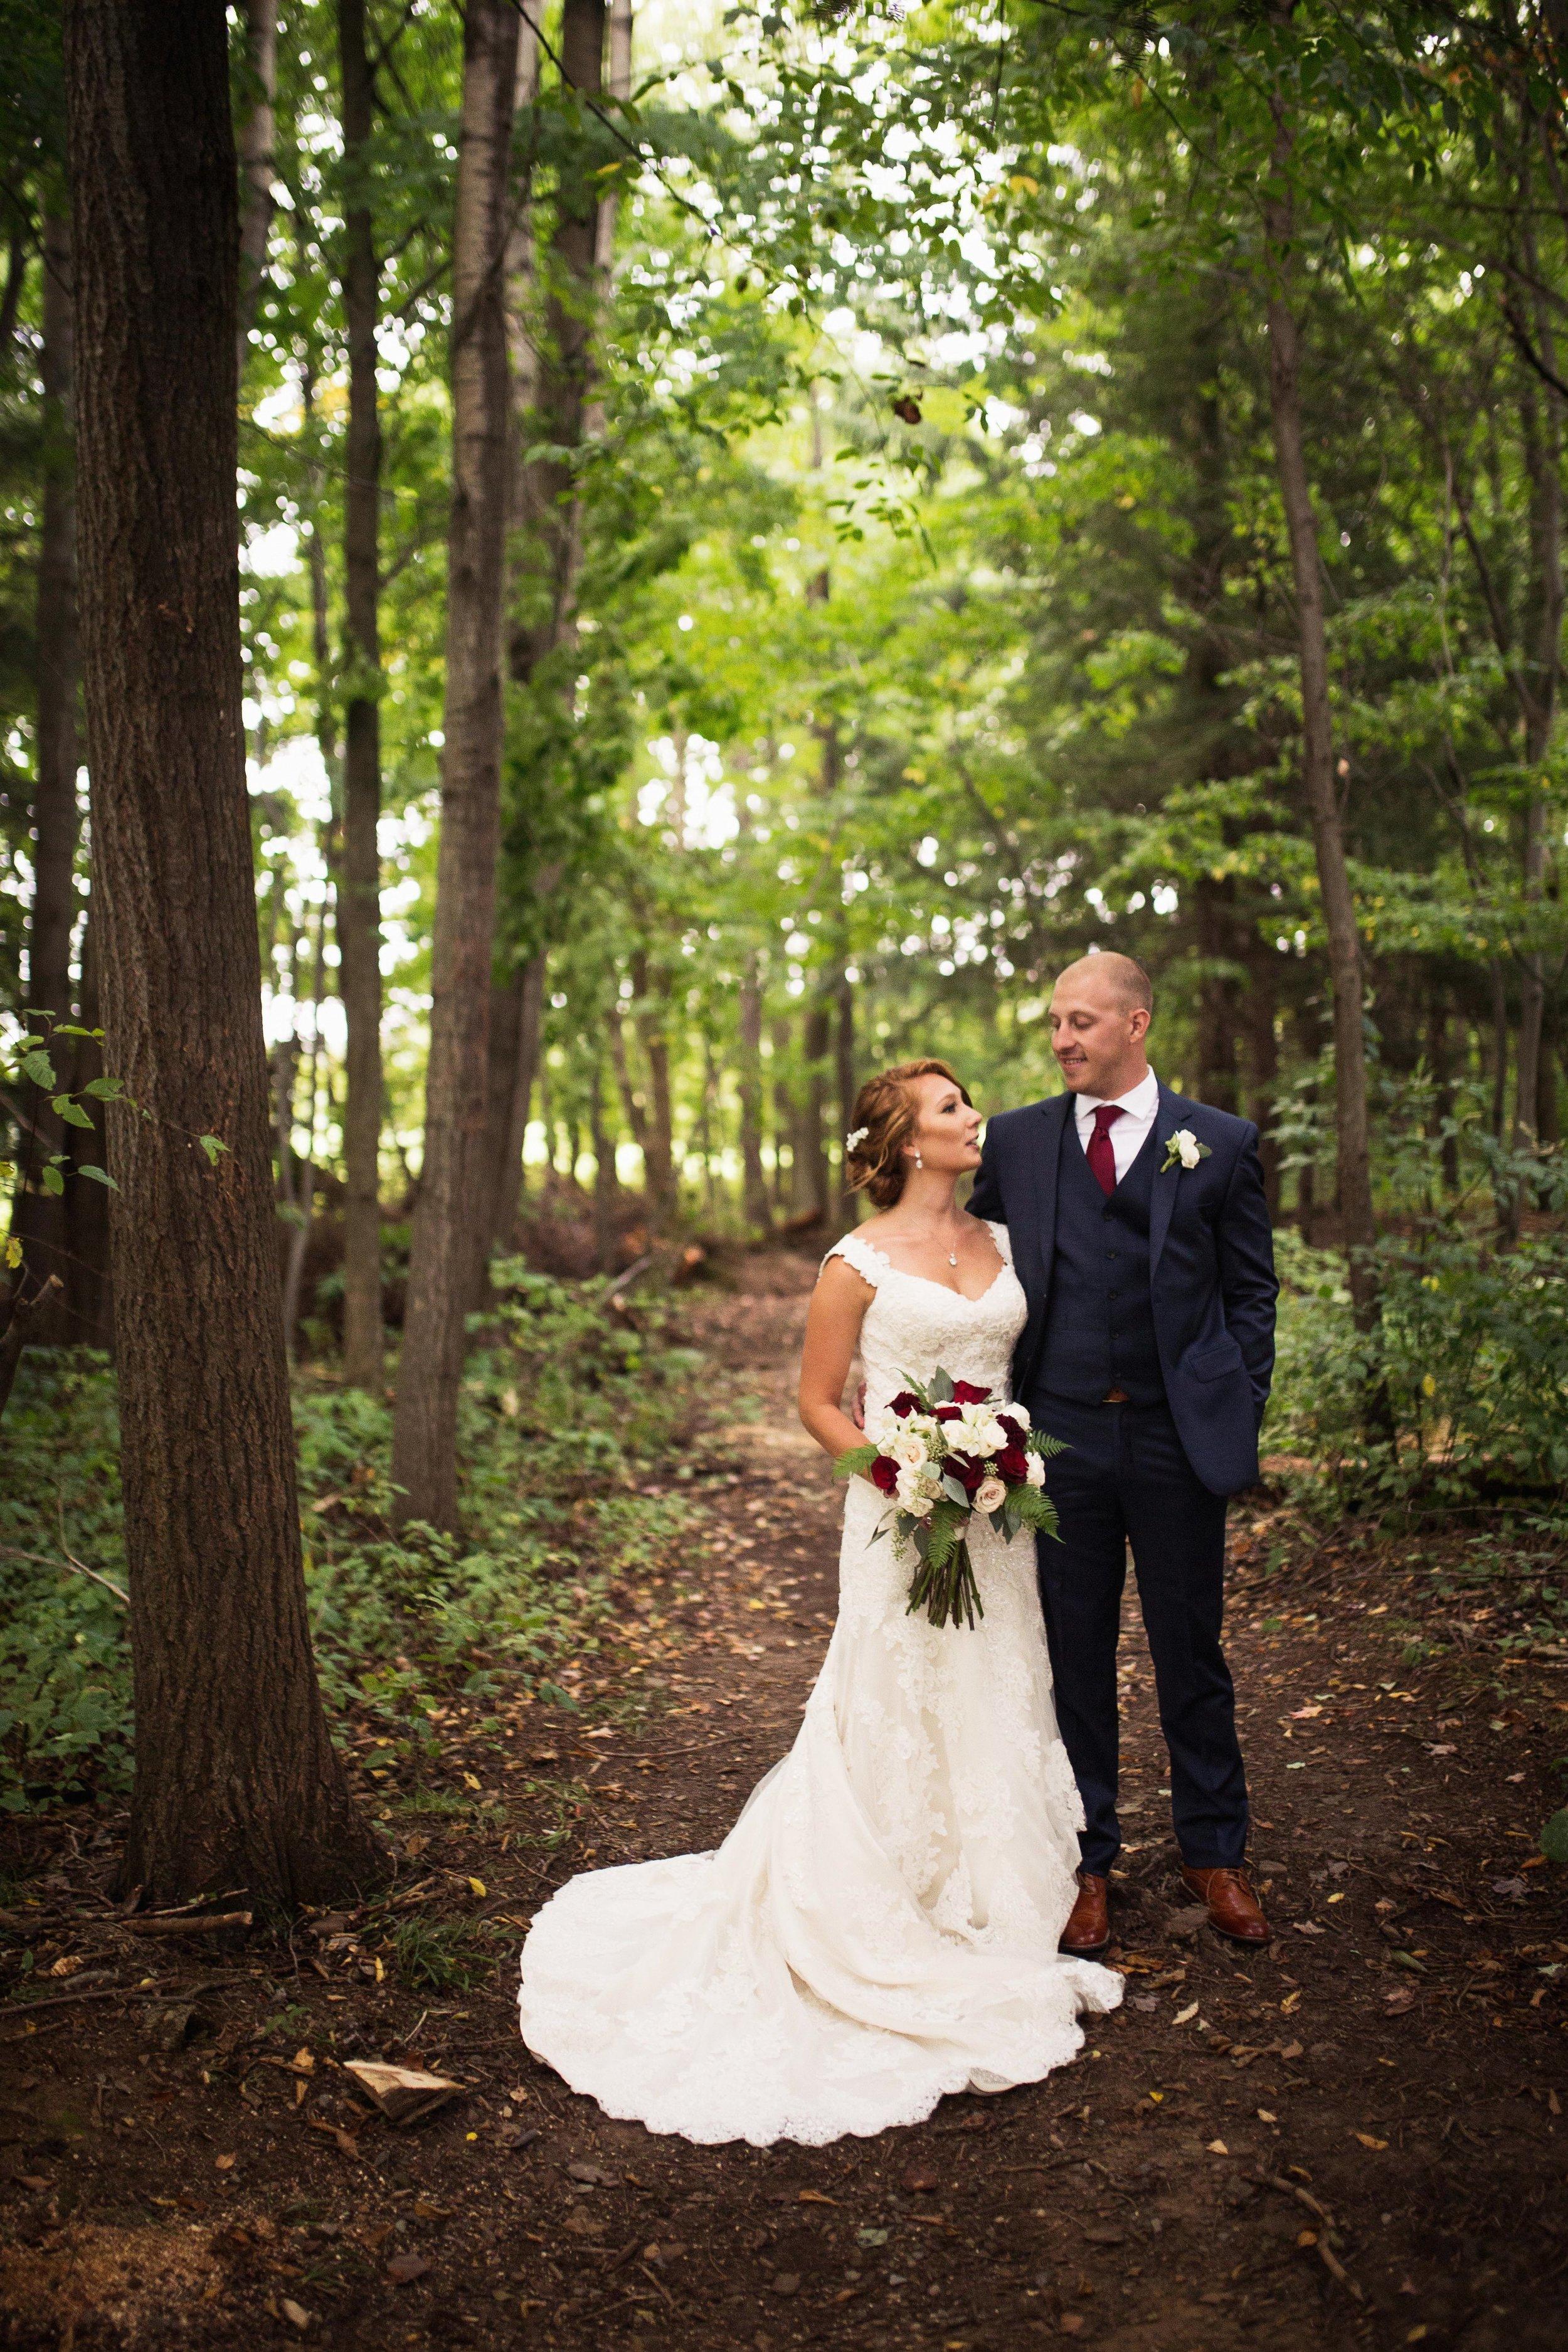 Blog-Lisa-James-Wedding-at Rosebud Estate Weddings in Arcade NY by Stefan-Ludwig-Photography-Buffalo-NY-26-x.jpg